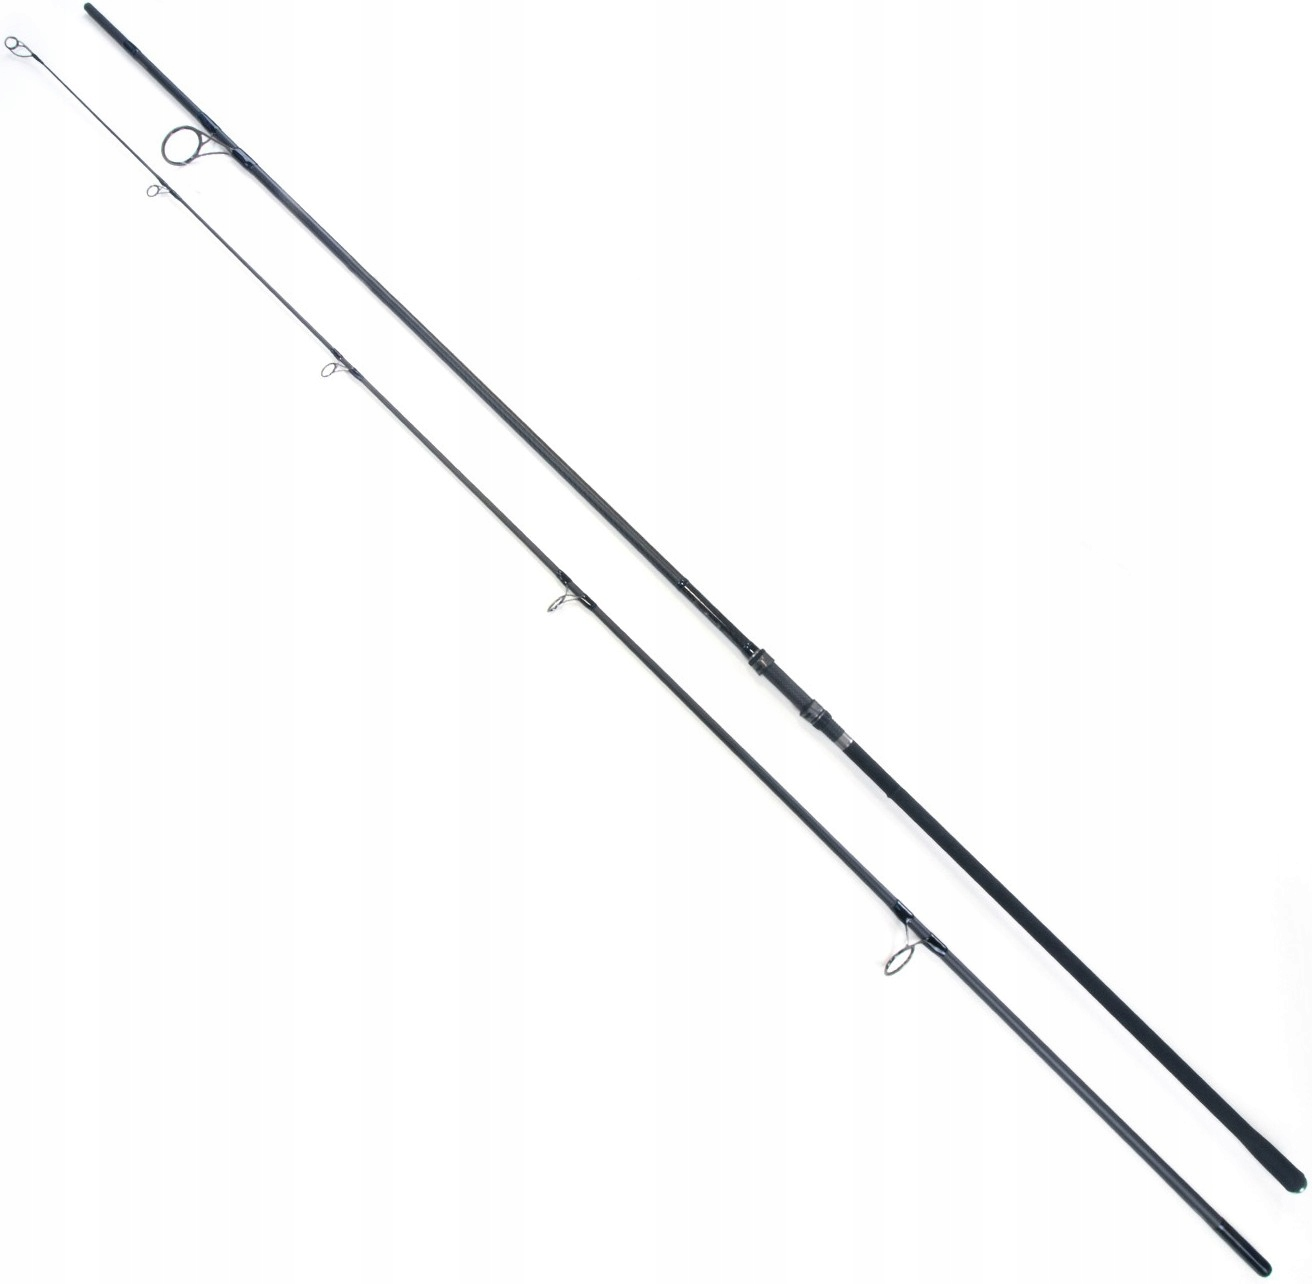 Rybolov-prút Shimano TX-4 10-325 - 3,04 m 3,25 lb